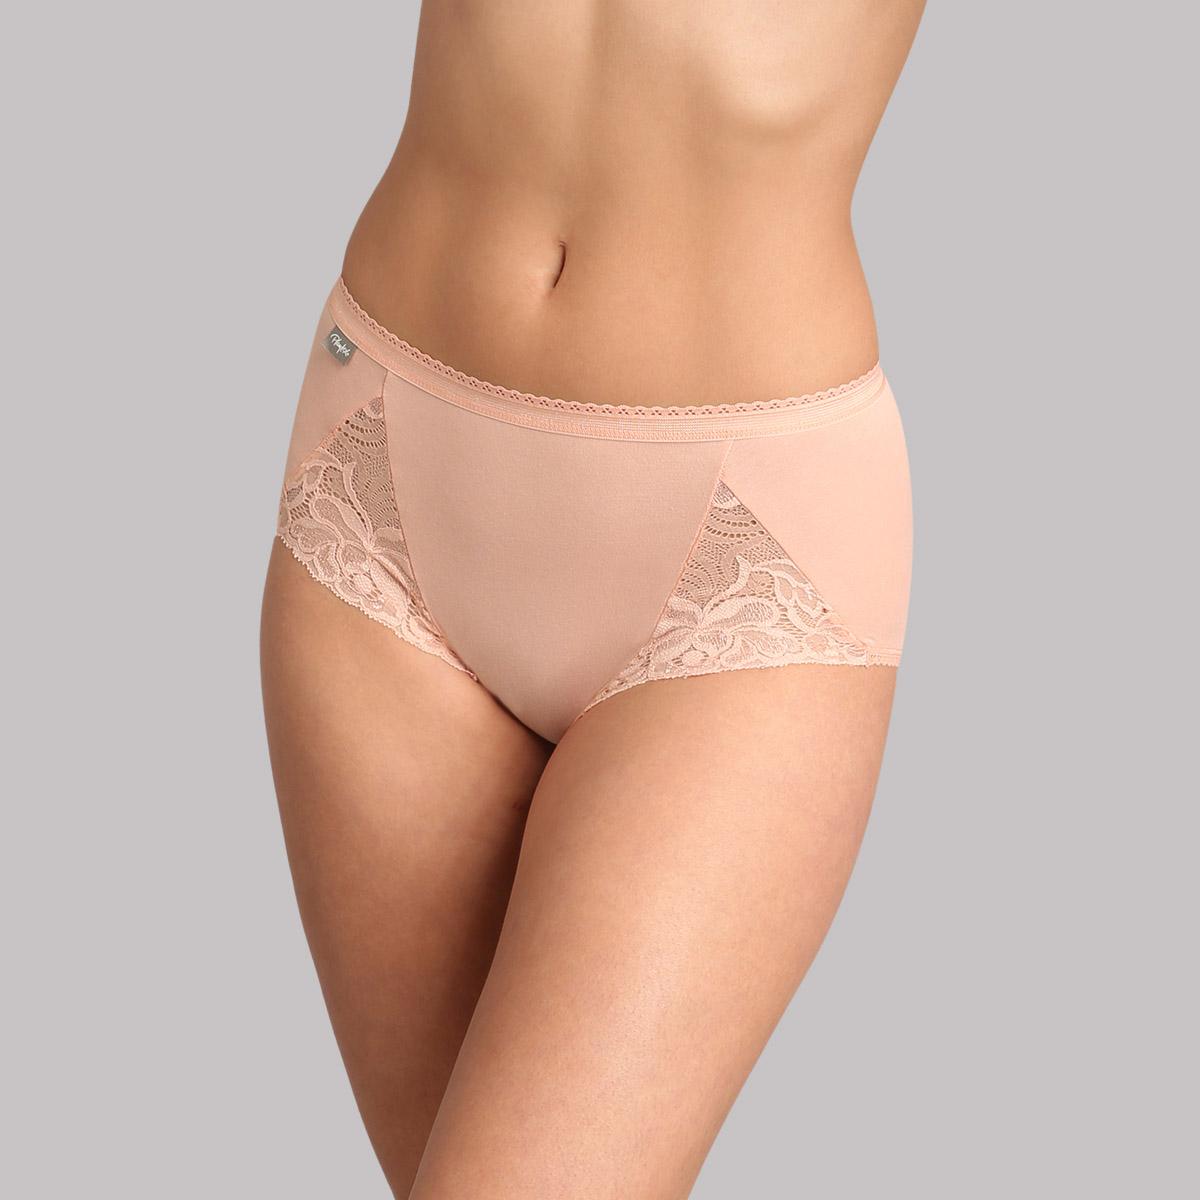 3 pack of midi knickers white/ pink sand/ black - Feminine Cotton , , PLAYTEX